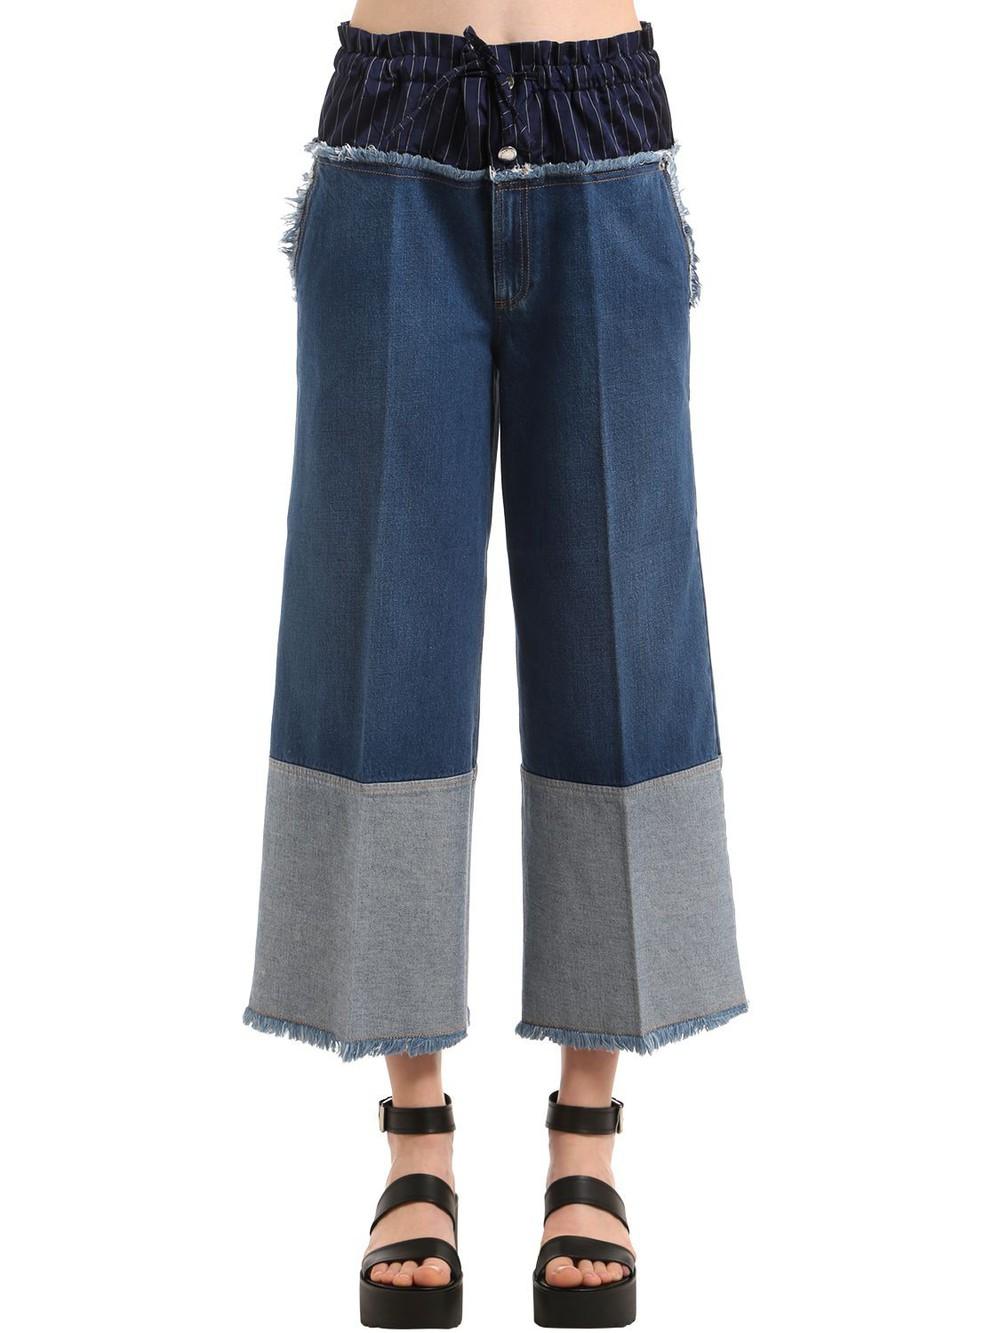 SONIA RYKIEL Cropped Denim Jeans W/ Boxer Waist in blue